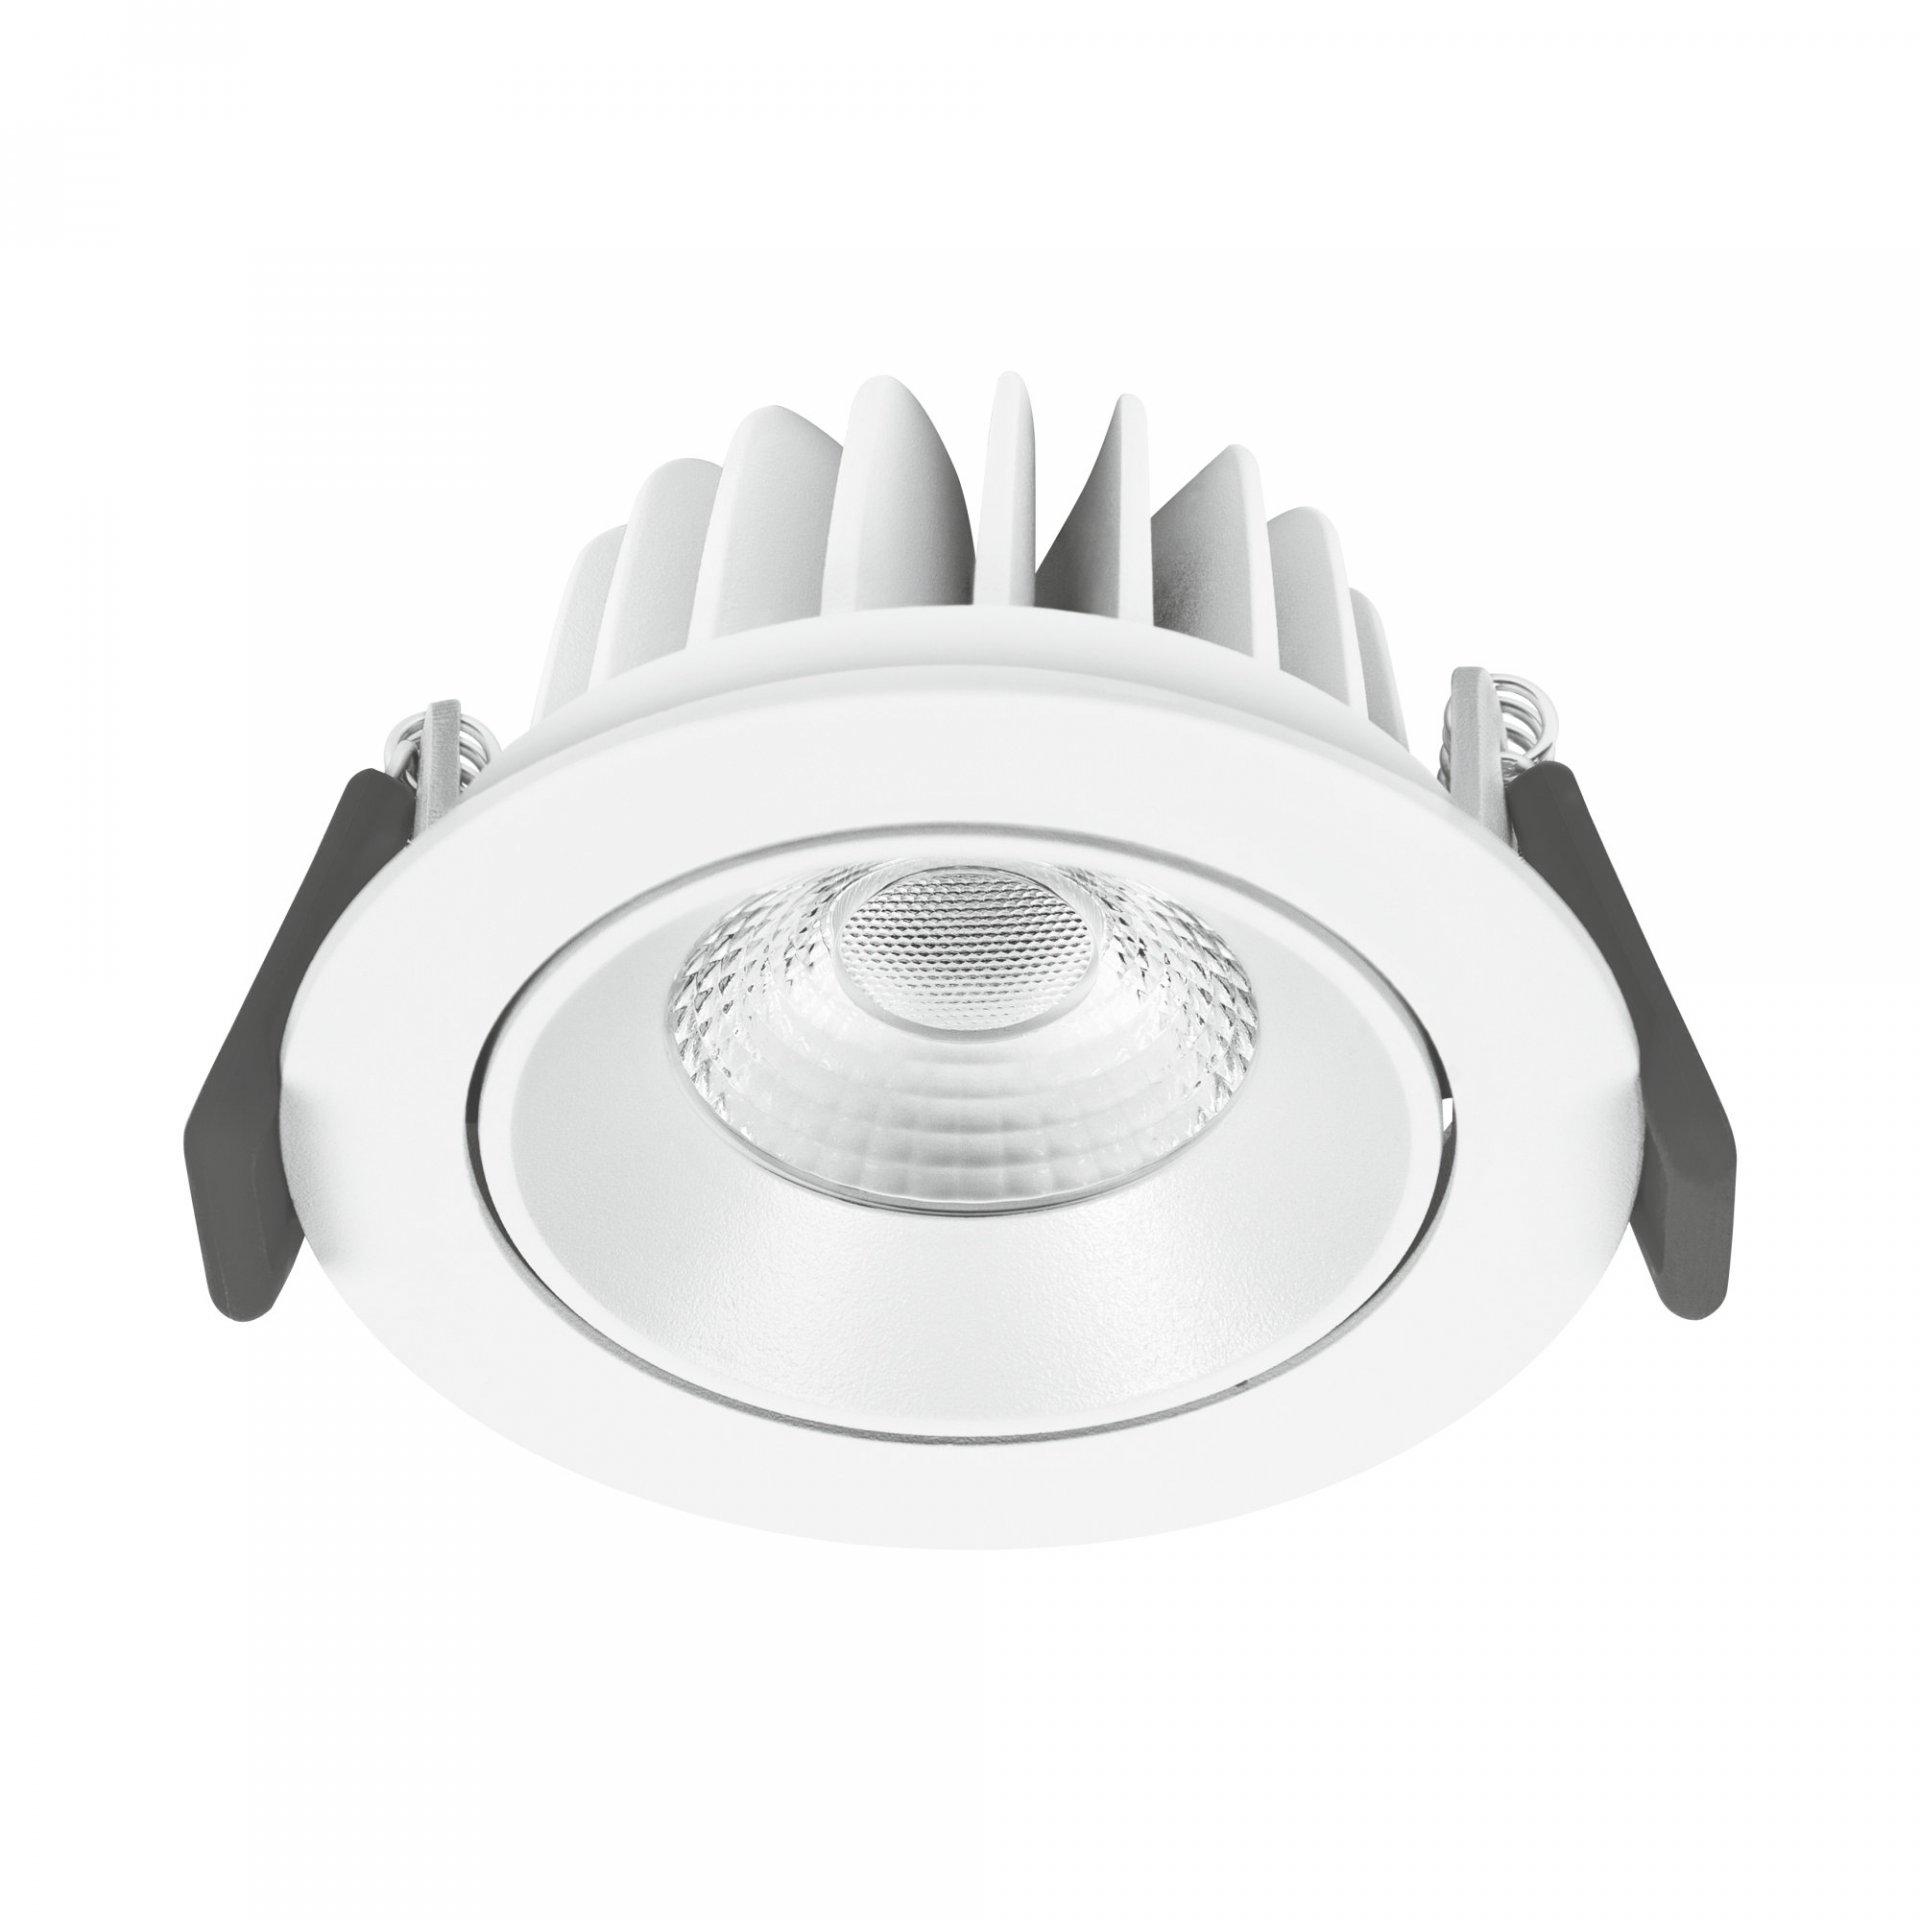 (310) SPOT LED 83 8W 3000K IP20 ADJ WT